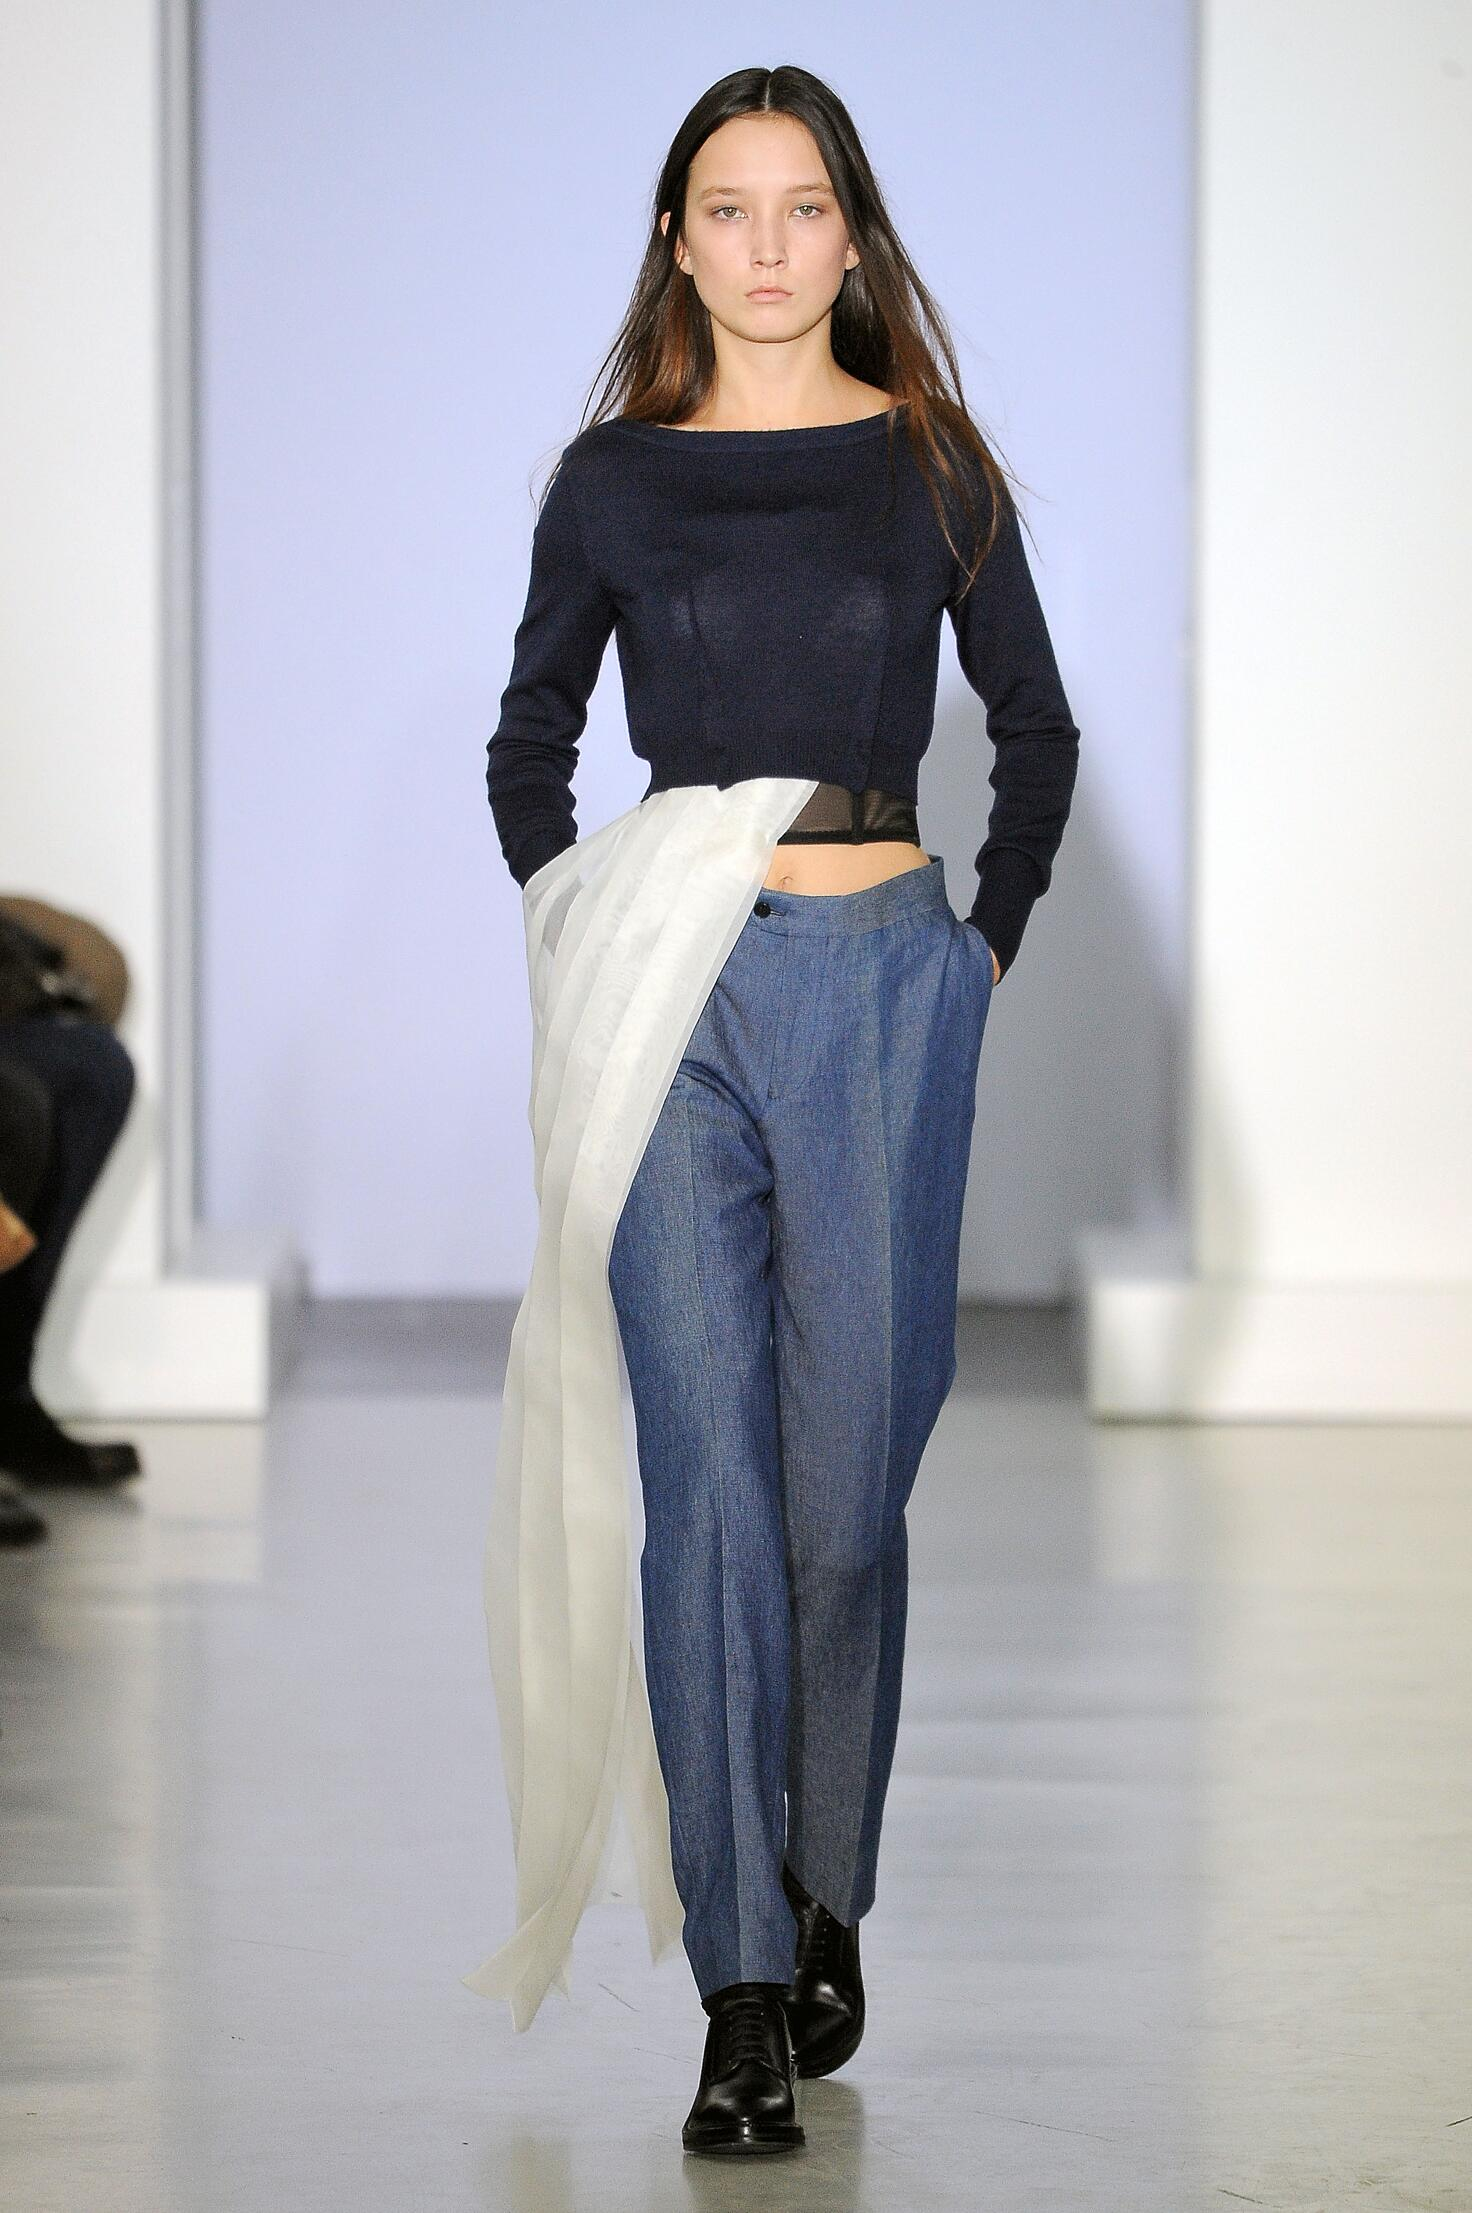 Summer 2015 Fashion Trends Yang Li